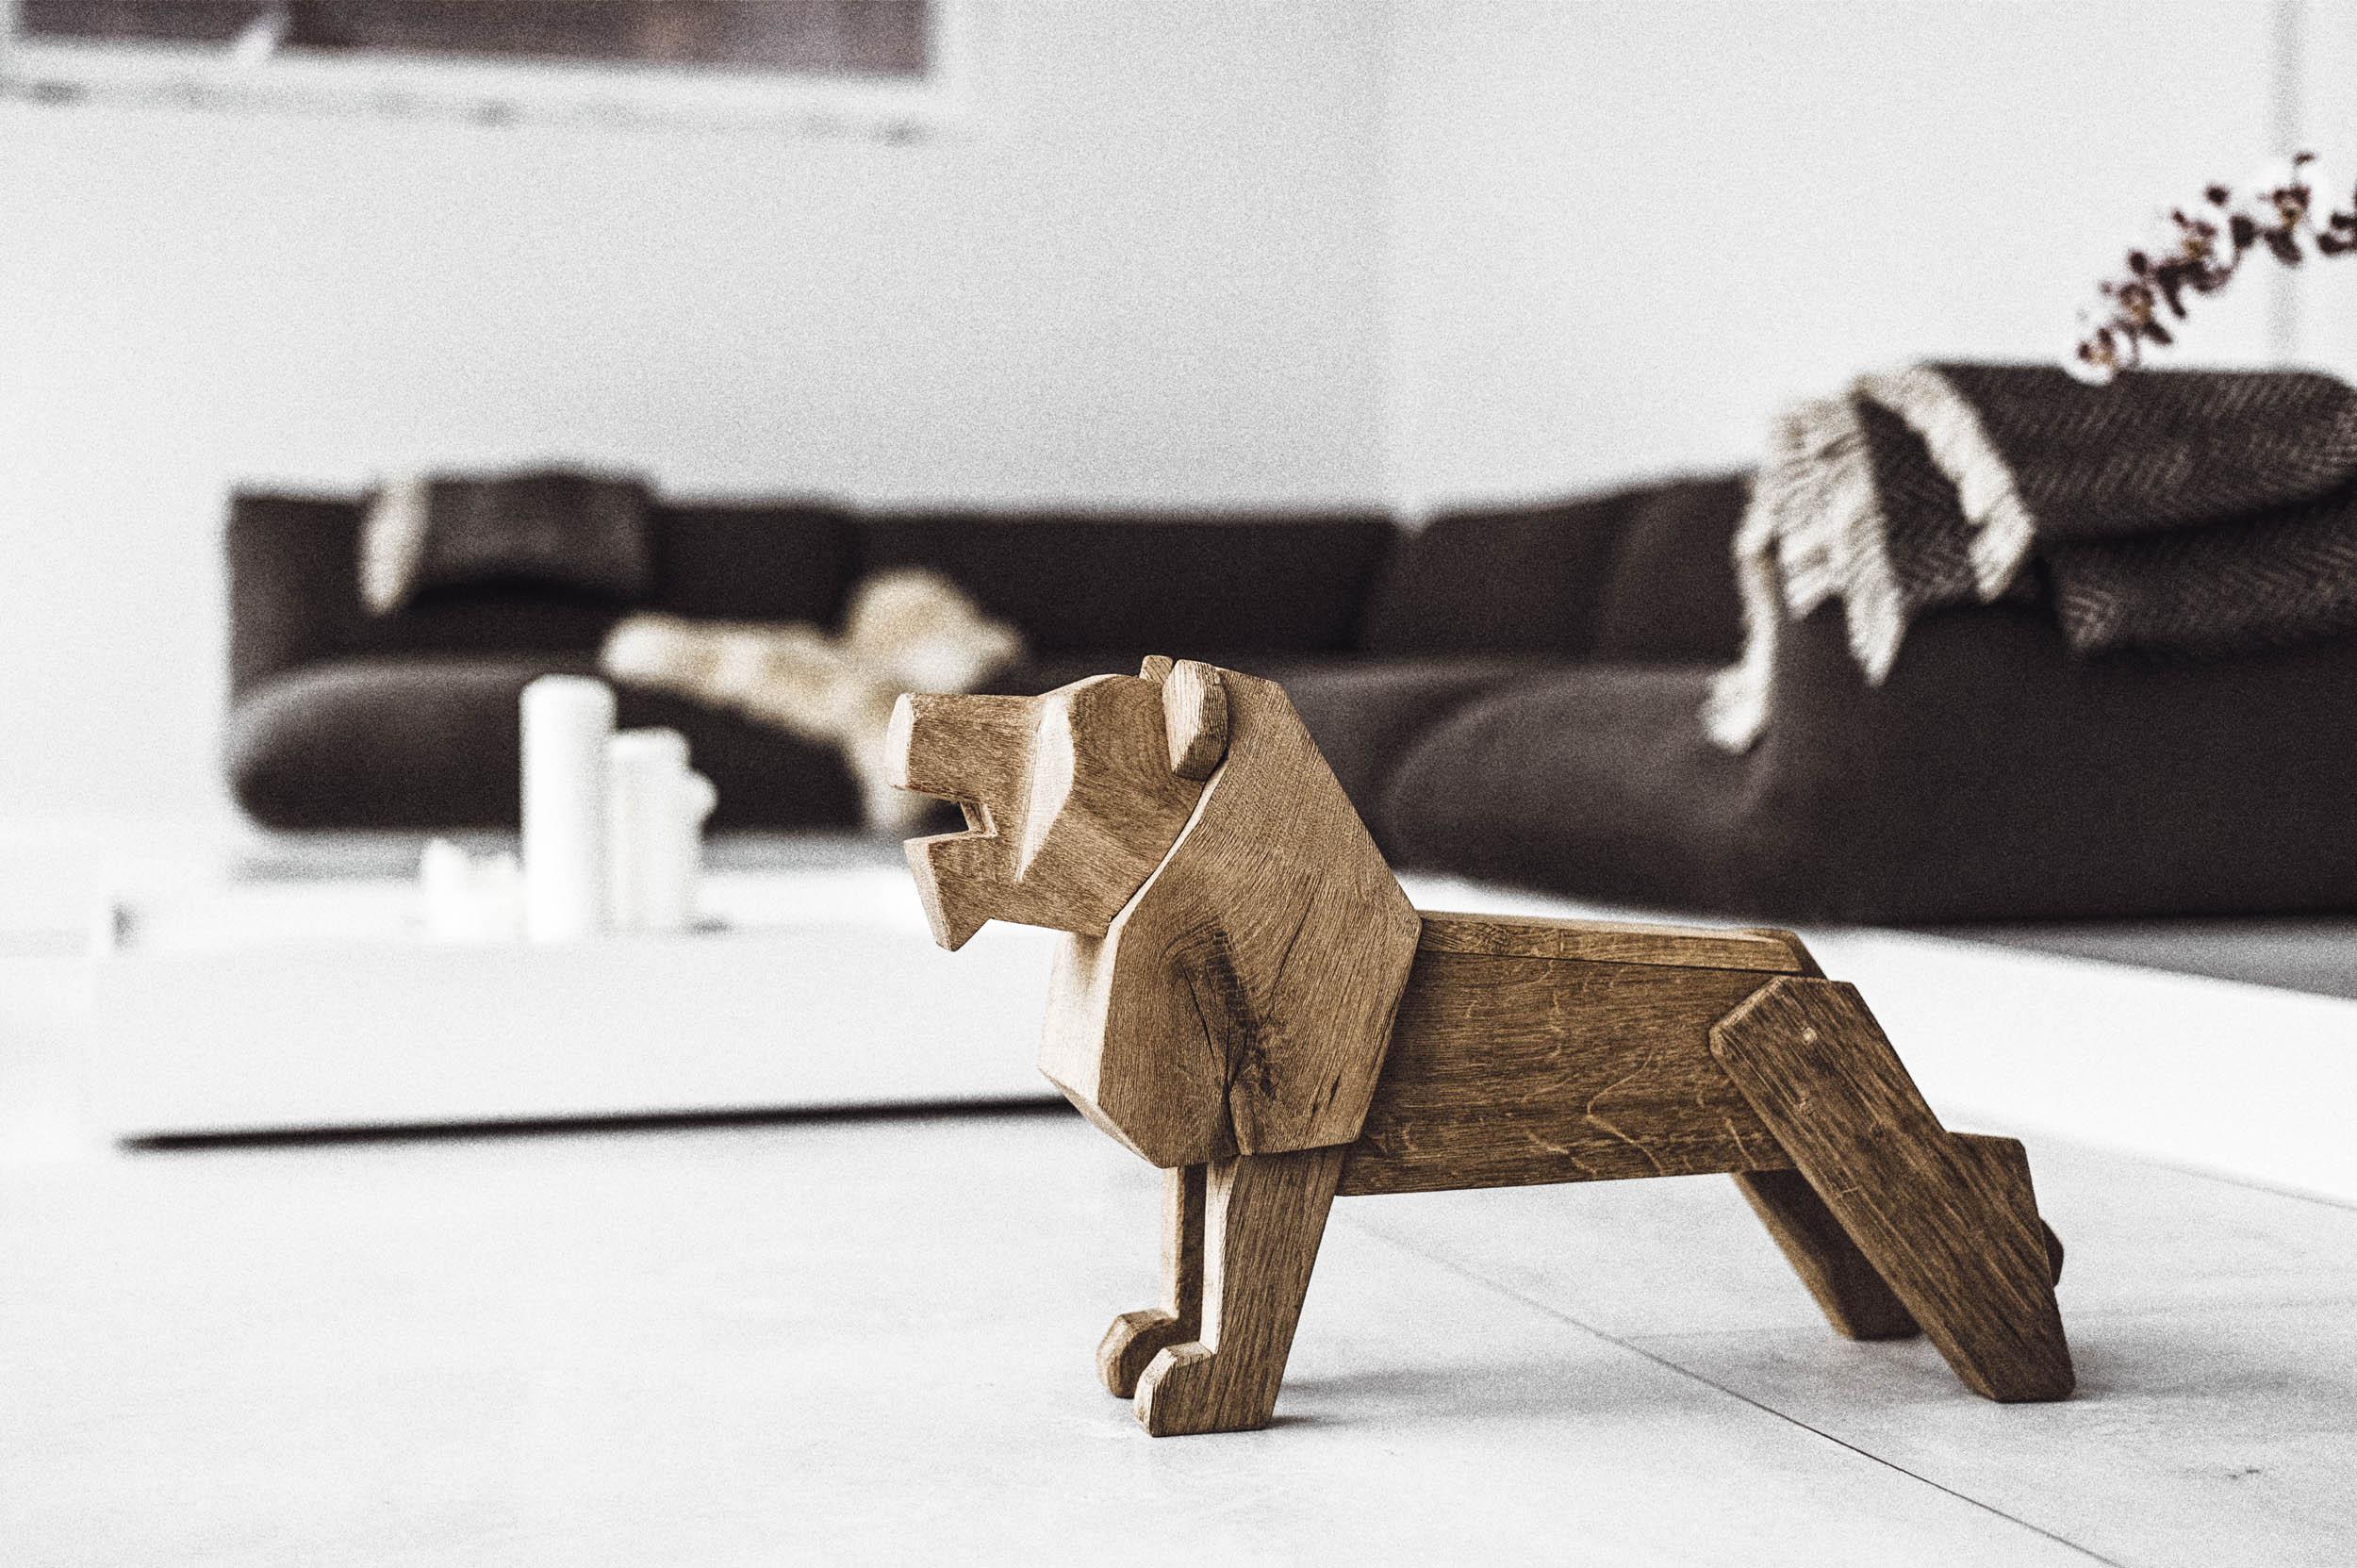 seifertuebler-corporate-handcraft-woodsculpture-vogel-14.jpg